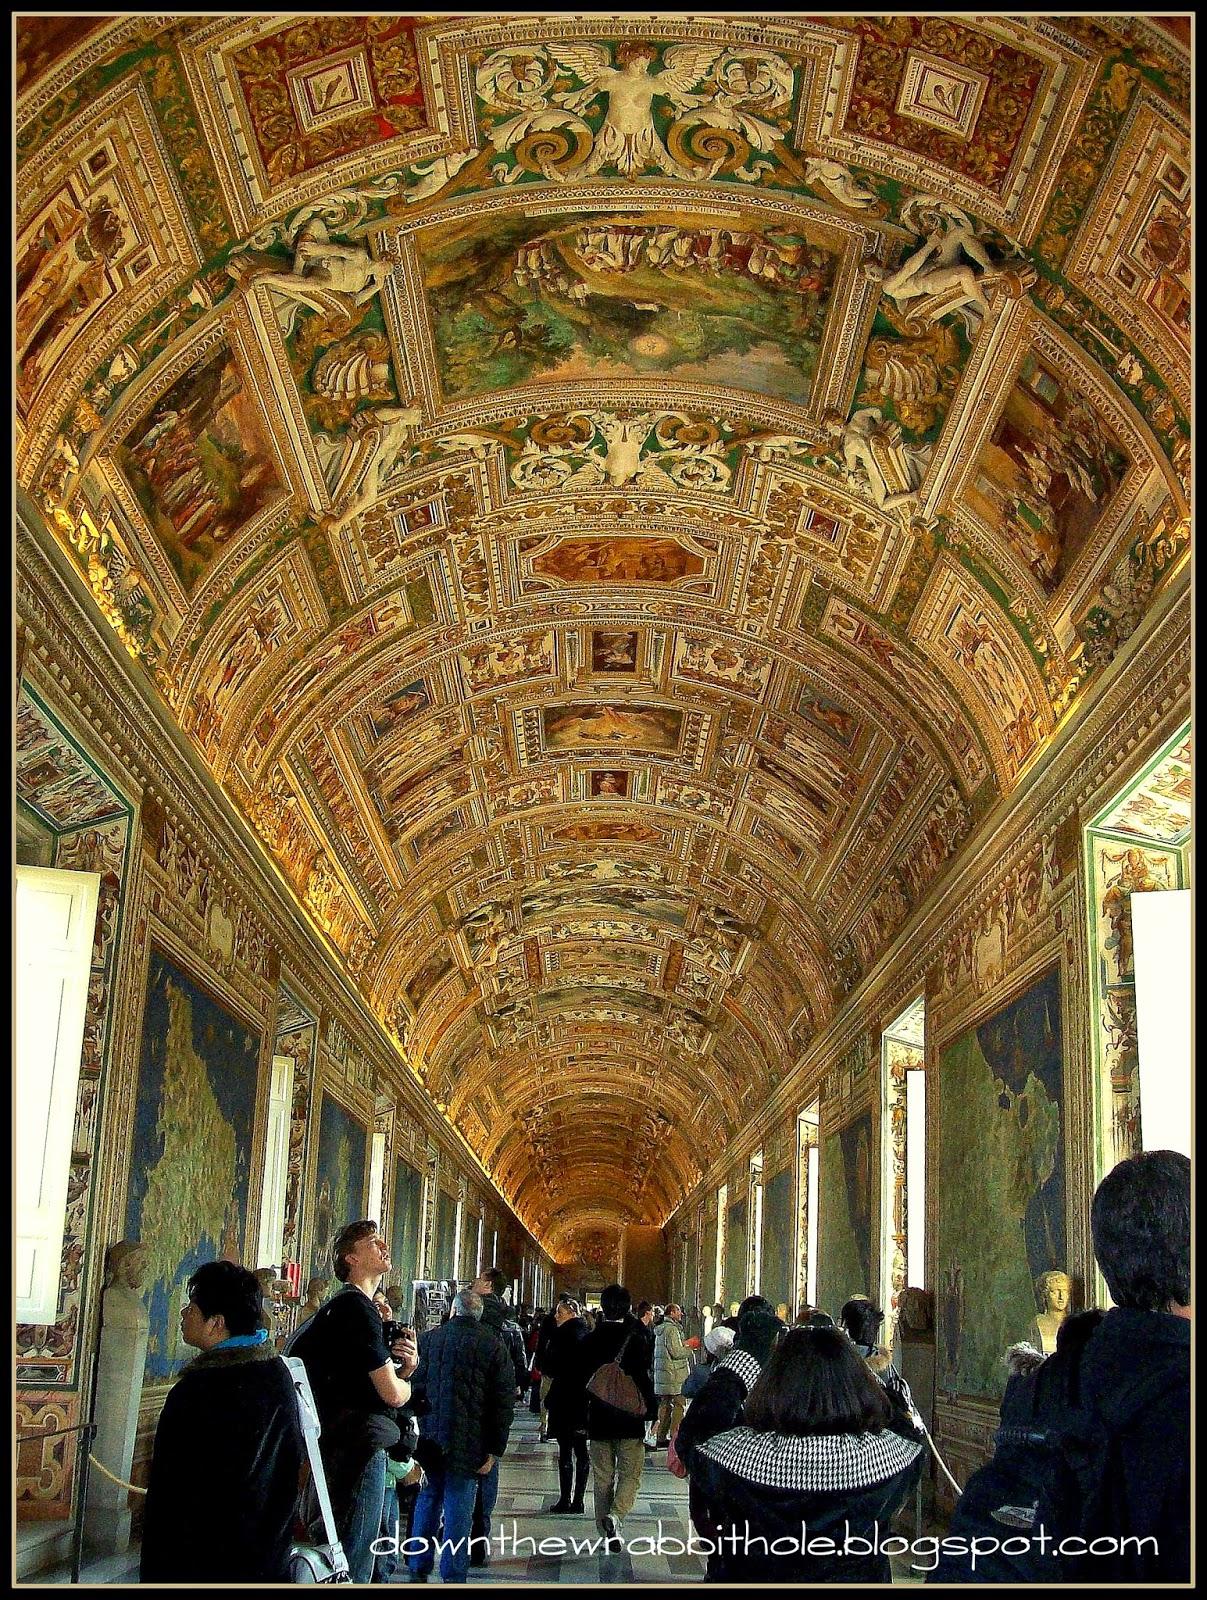 Visit Vatican City, The Sistine Chapel & St. Peter's Basilica